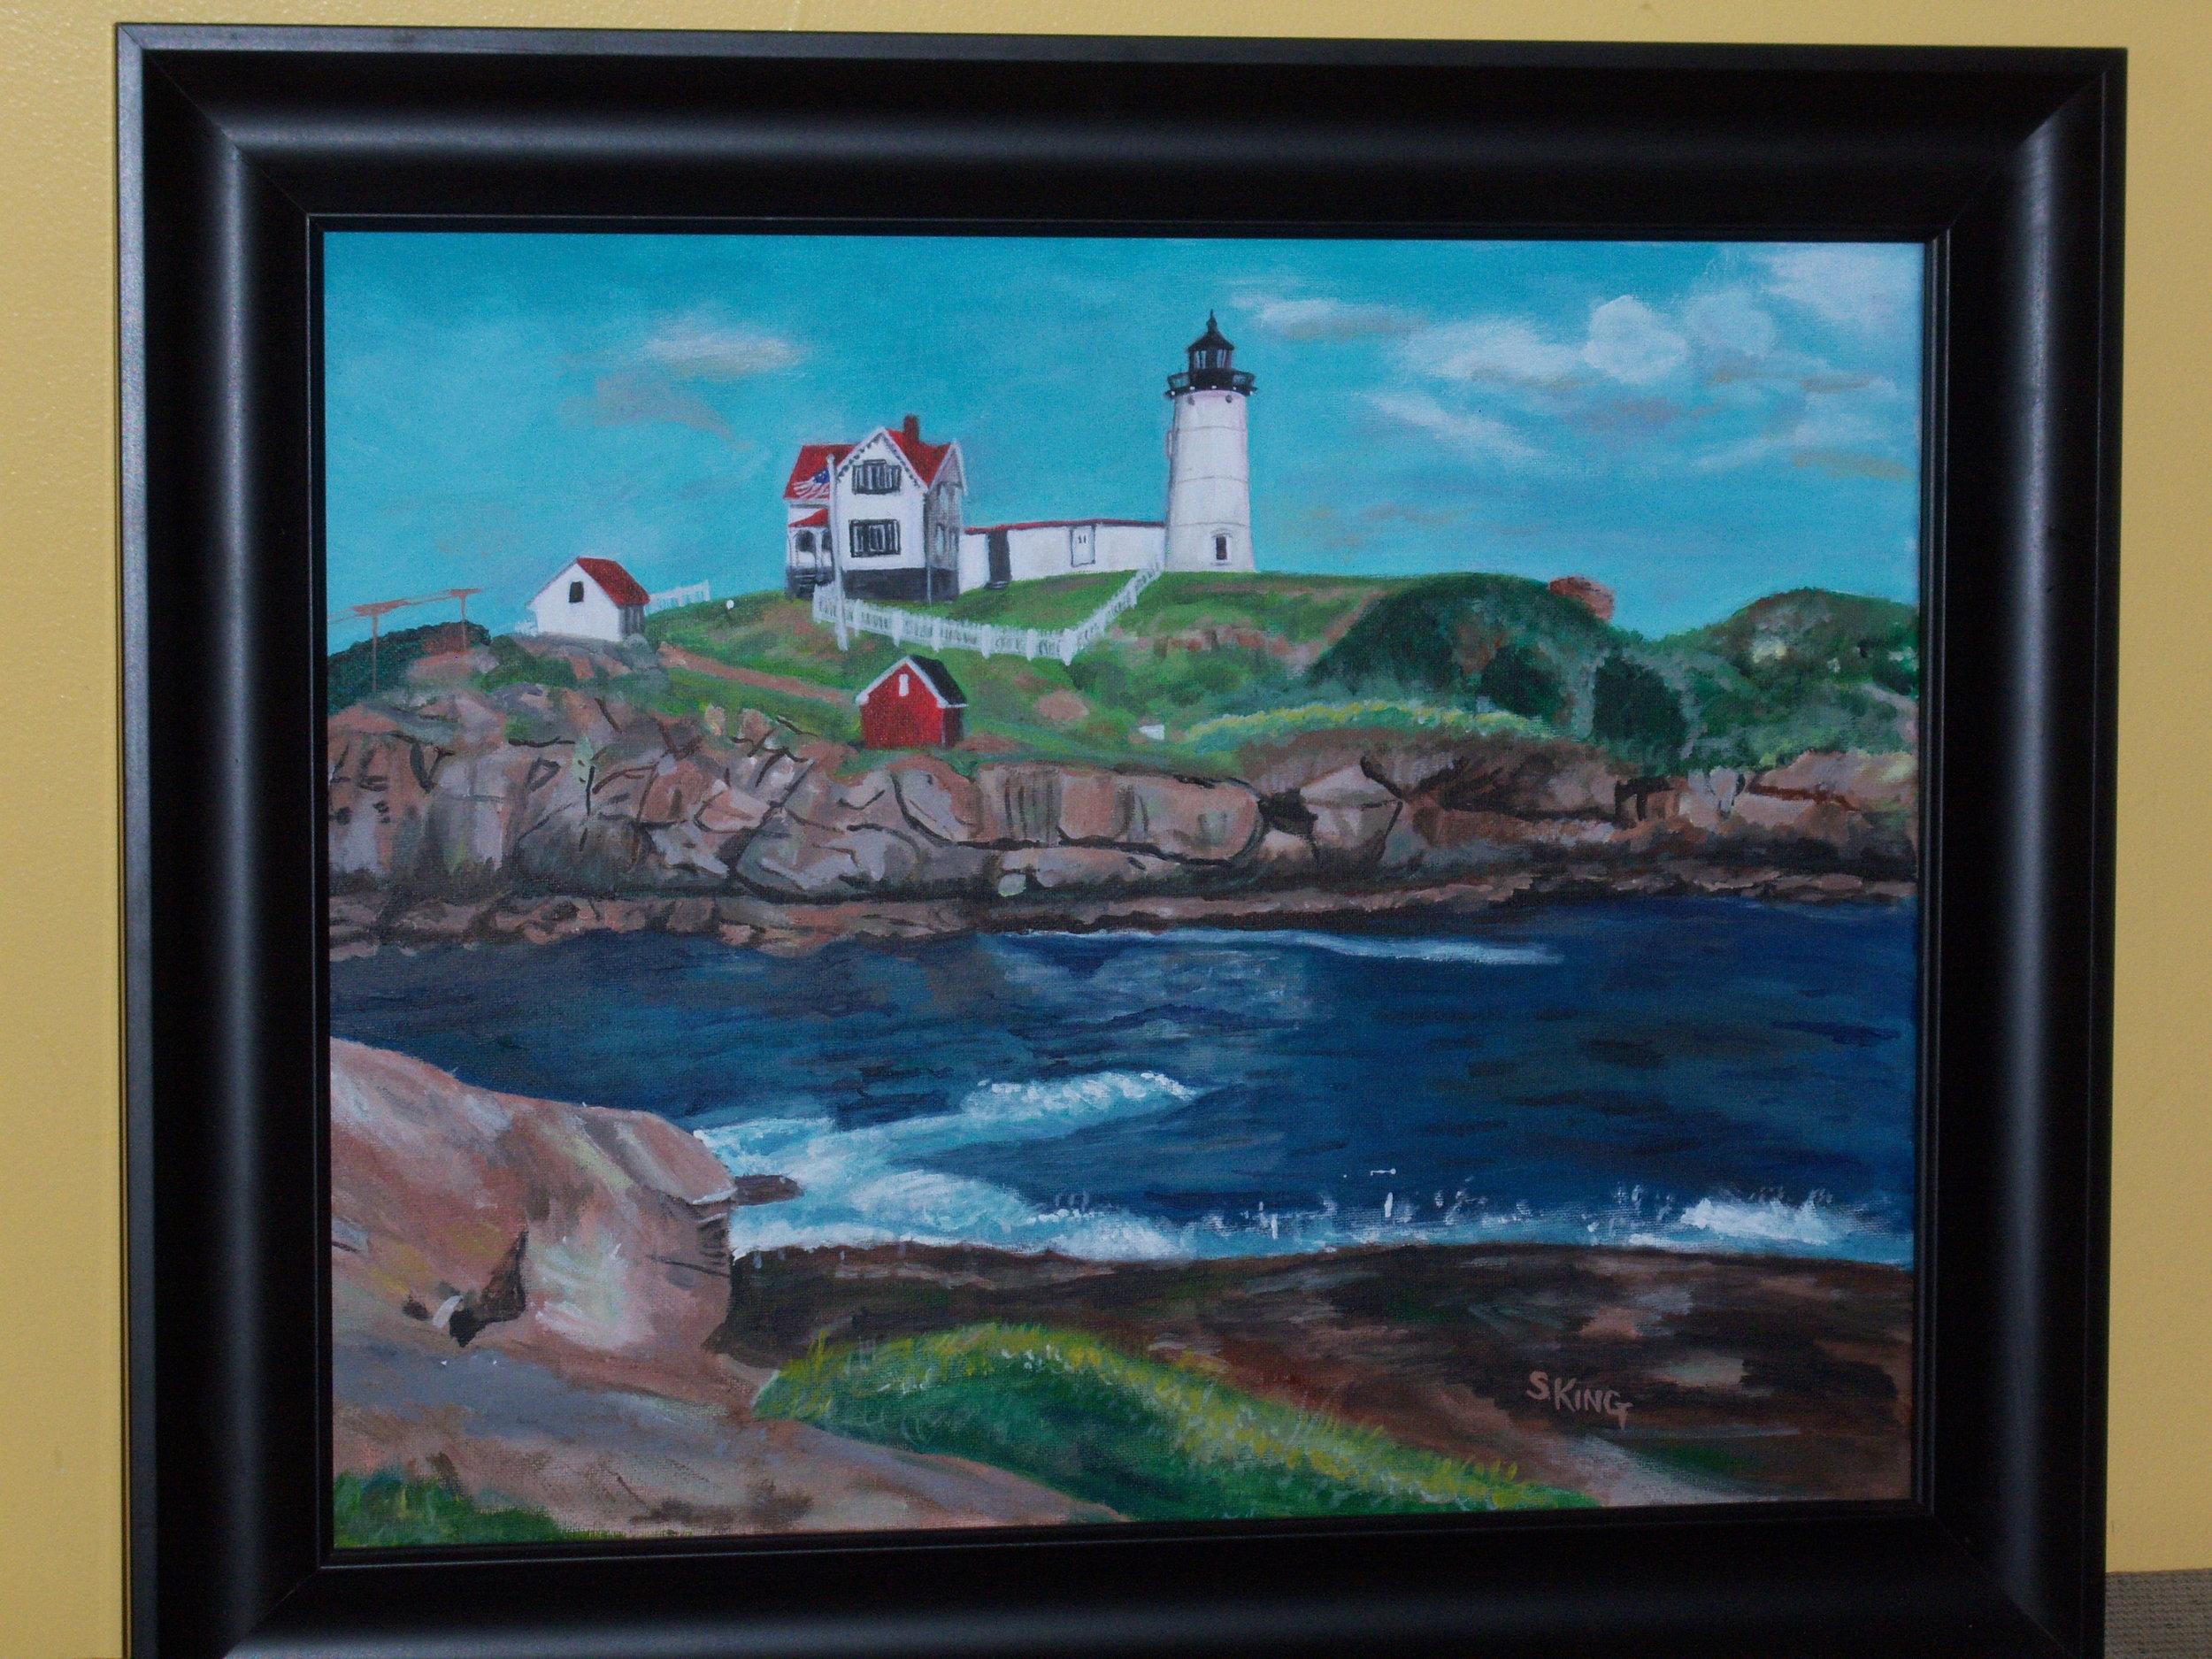 SusanKing_NubbleLighthouse-YorkME4-16x20-Acrylics-$400.JPG